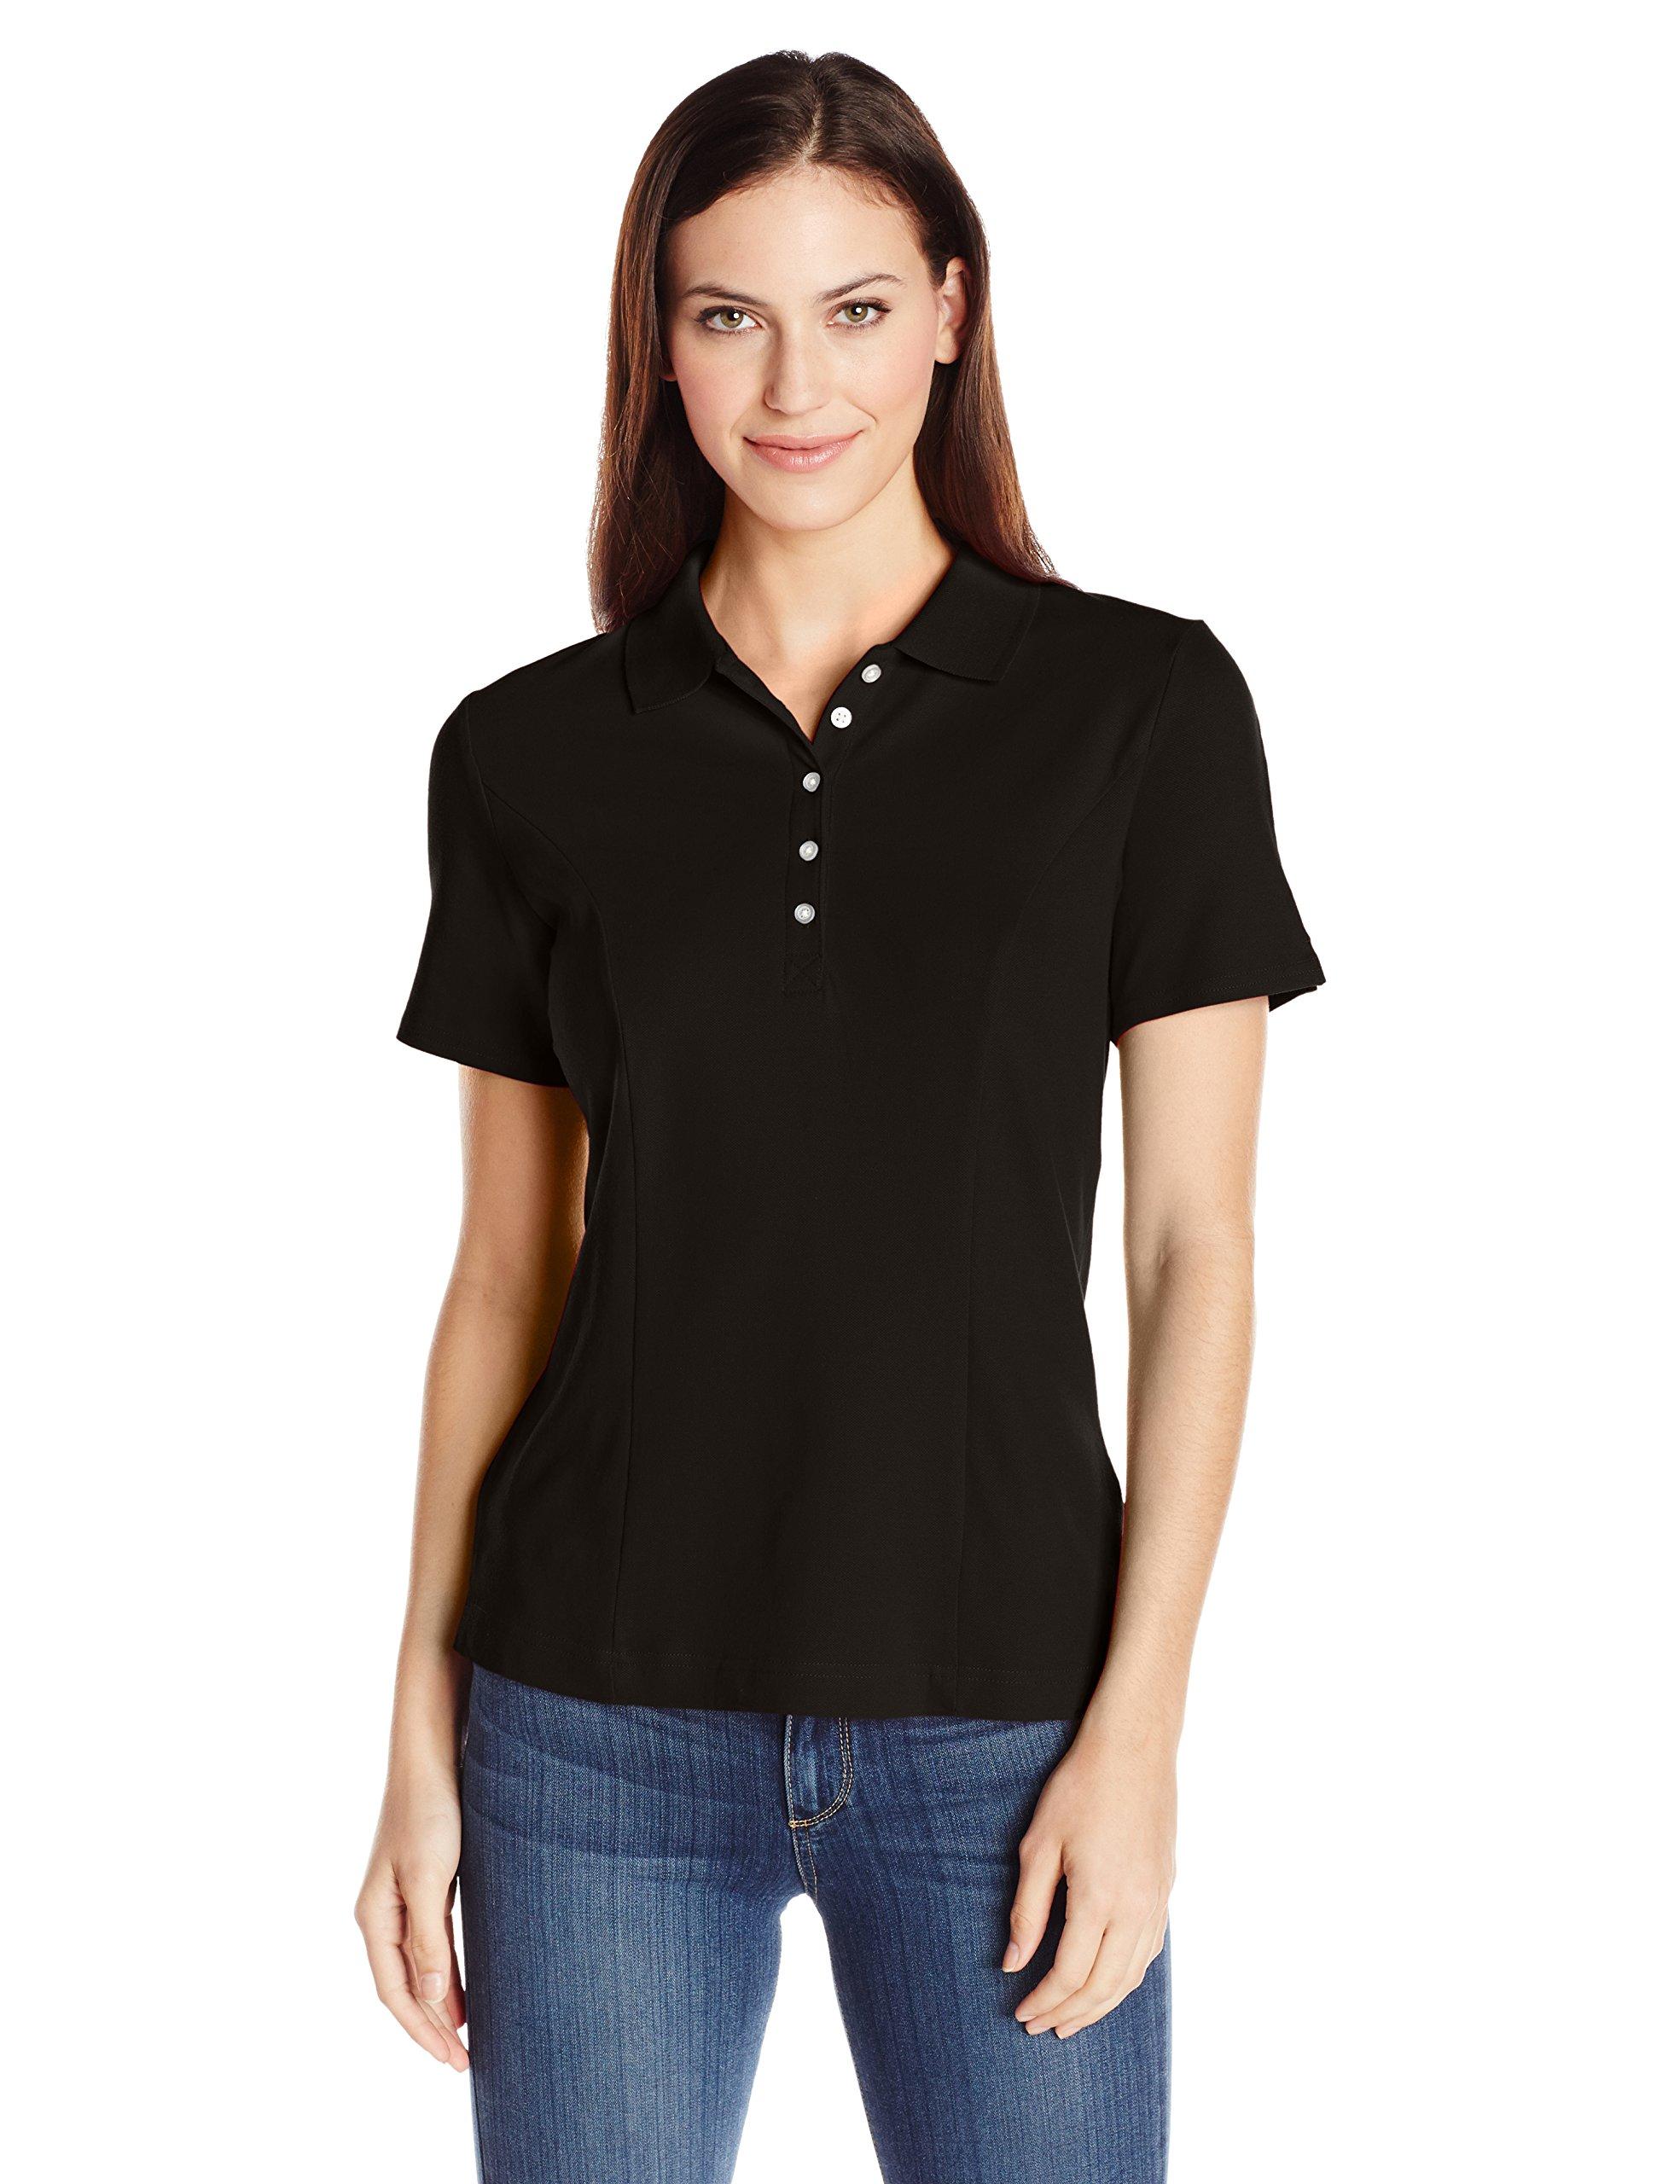 Riders by Lee Indigo Women's Morgan Short Sleeve Polo Shirt, Black Soot, Large